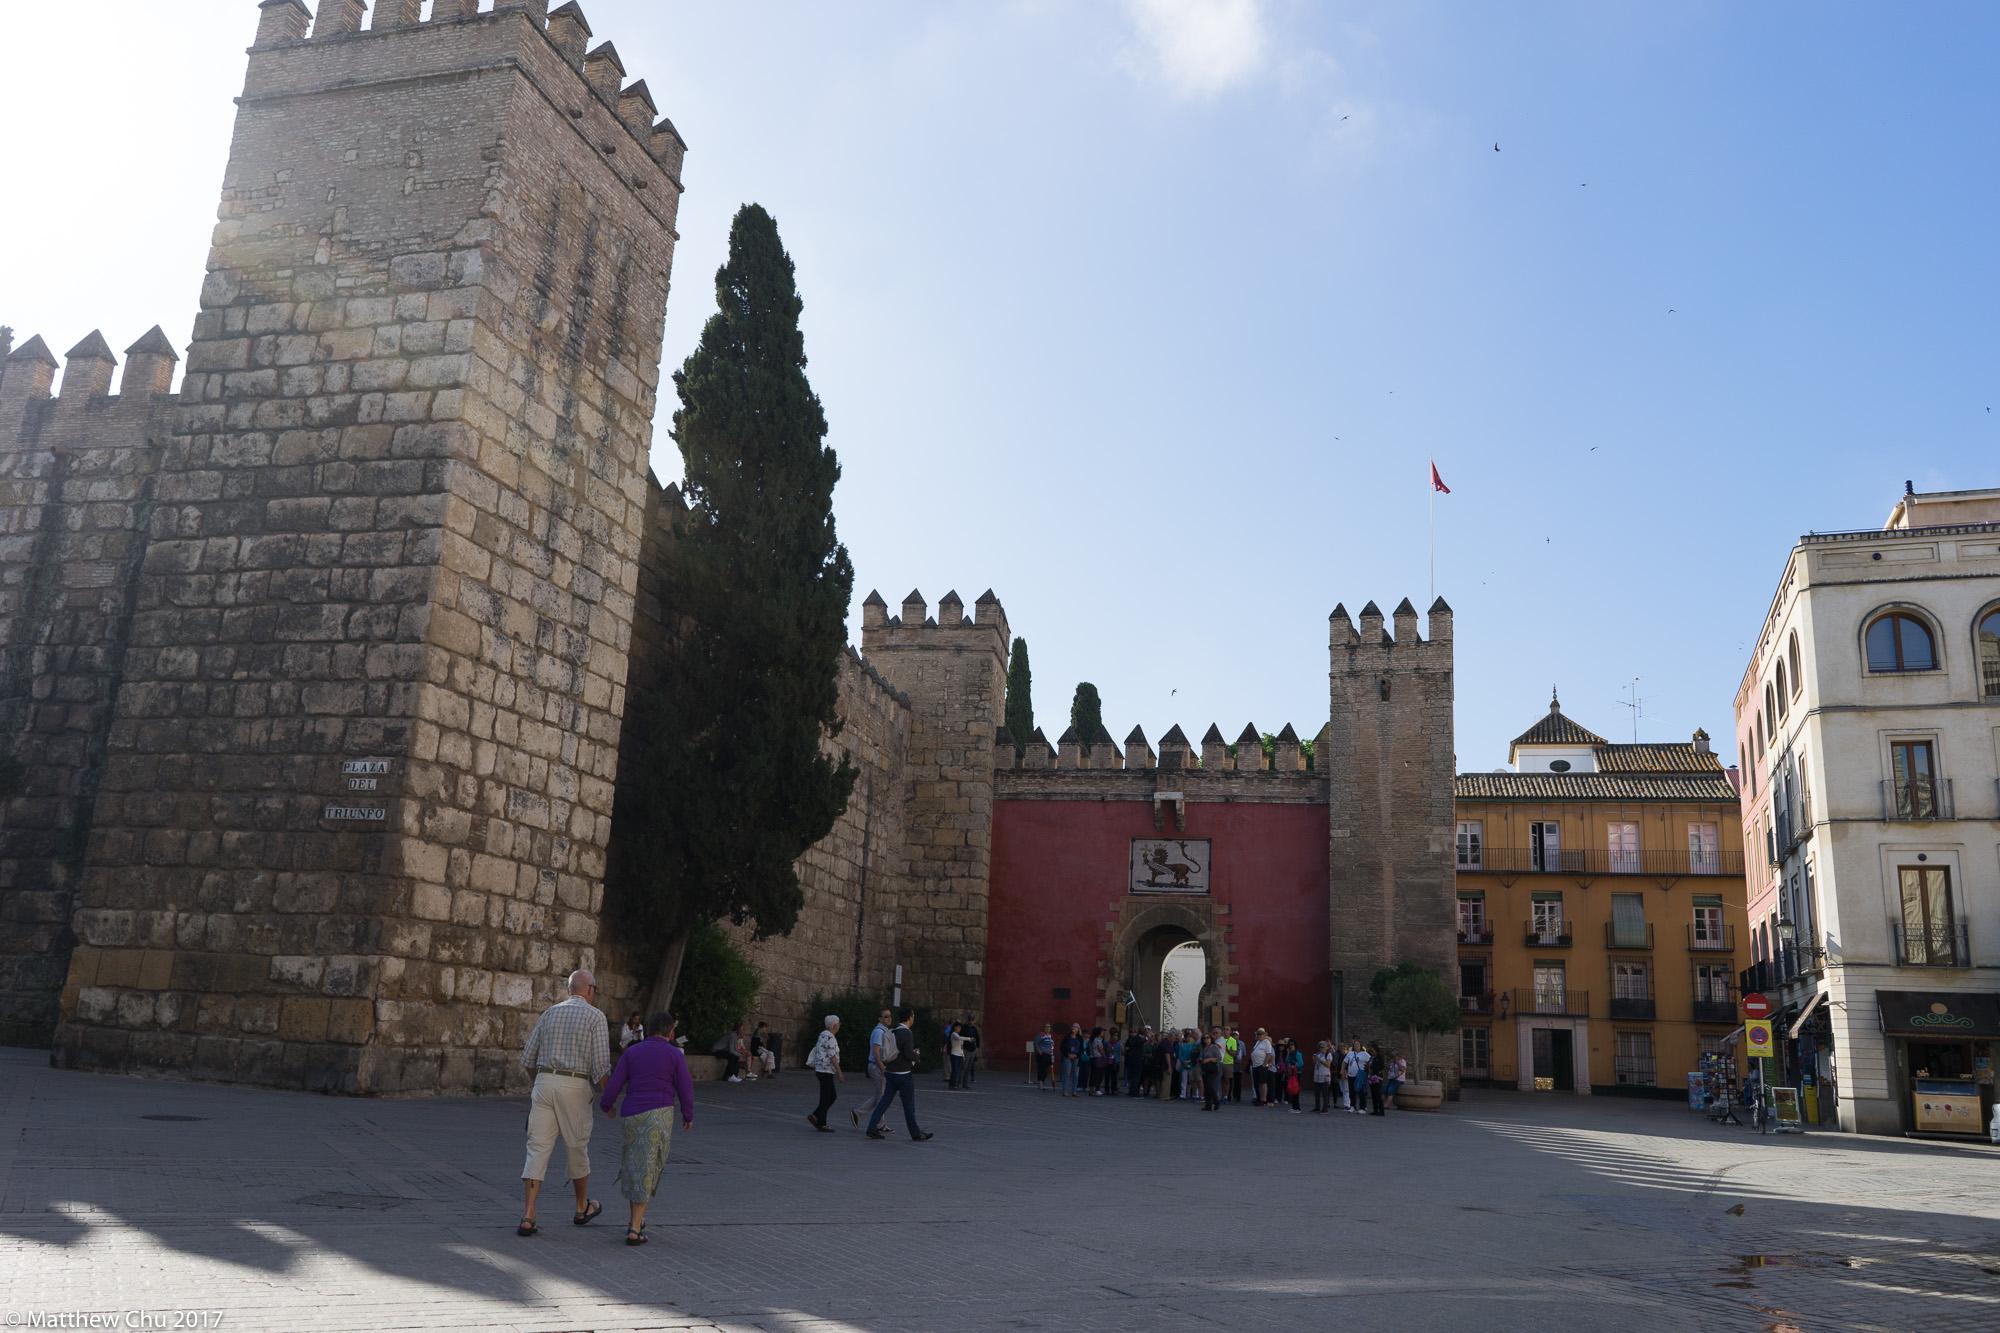 The Royal Alcázars of Seville, Seville, Spain, Spain